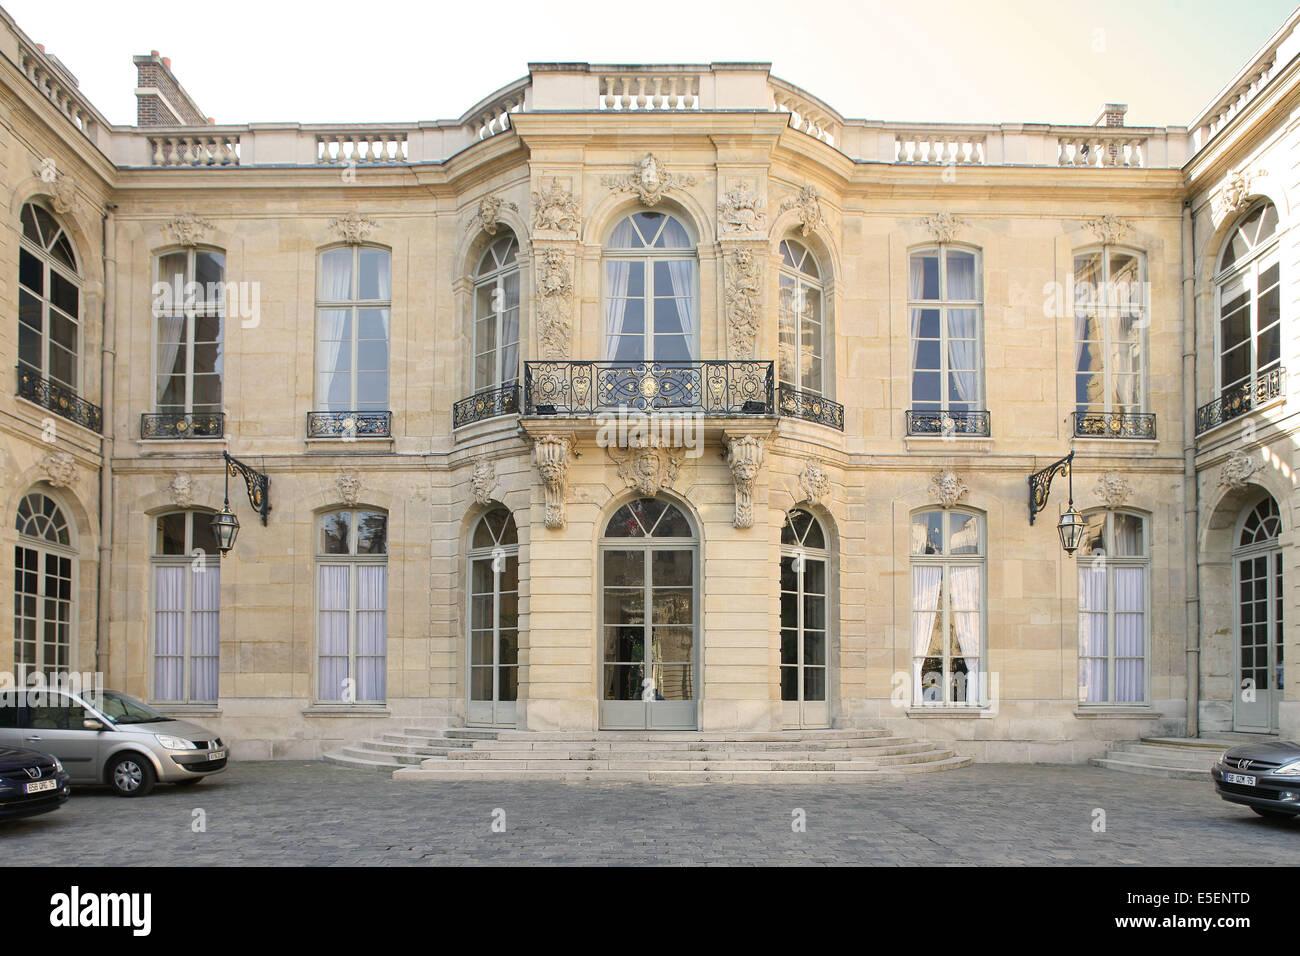 france paris 7e hotel particulier hotel de matignon 56 rue de stock photo royalty free. Black Bedroom Furniture Sets. Home Design Ideas